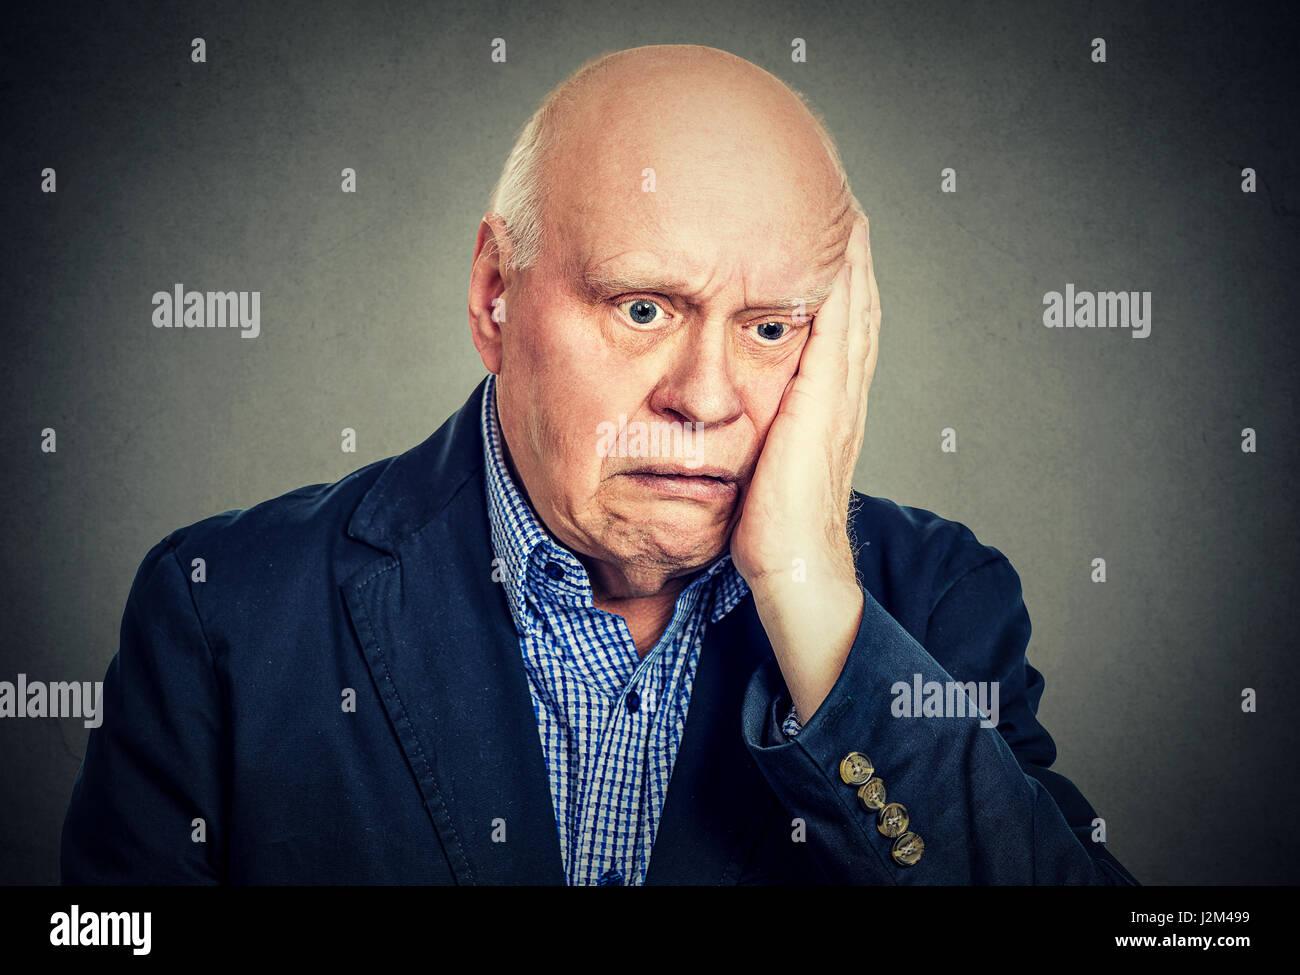 Retrato de ancianos desesperados triste Imagen De Stock